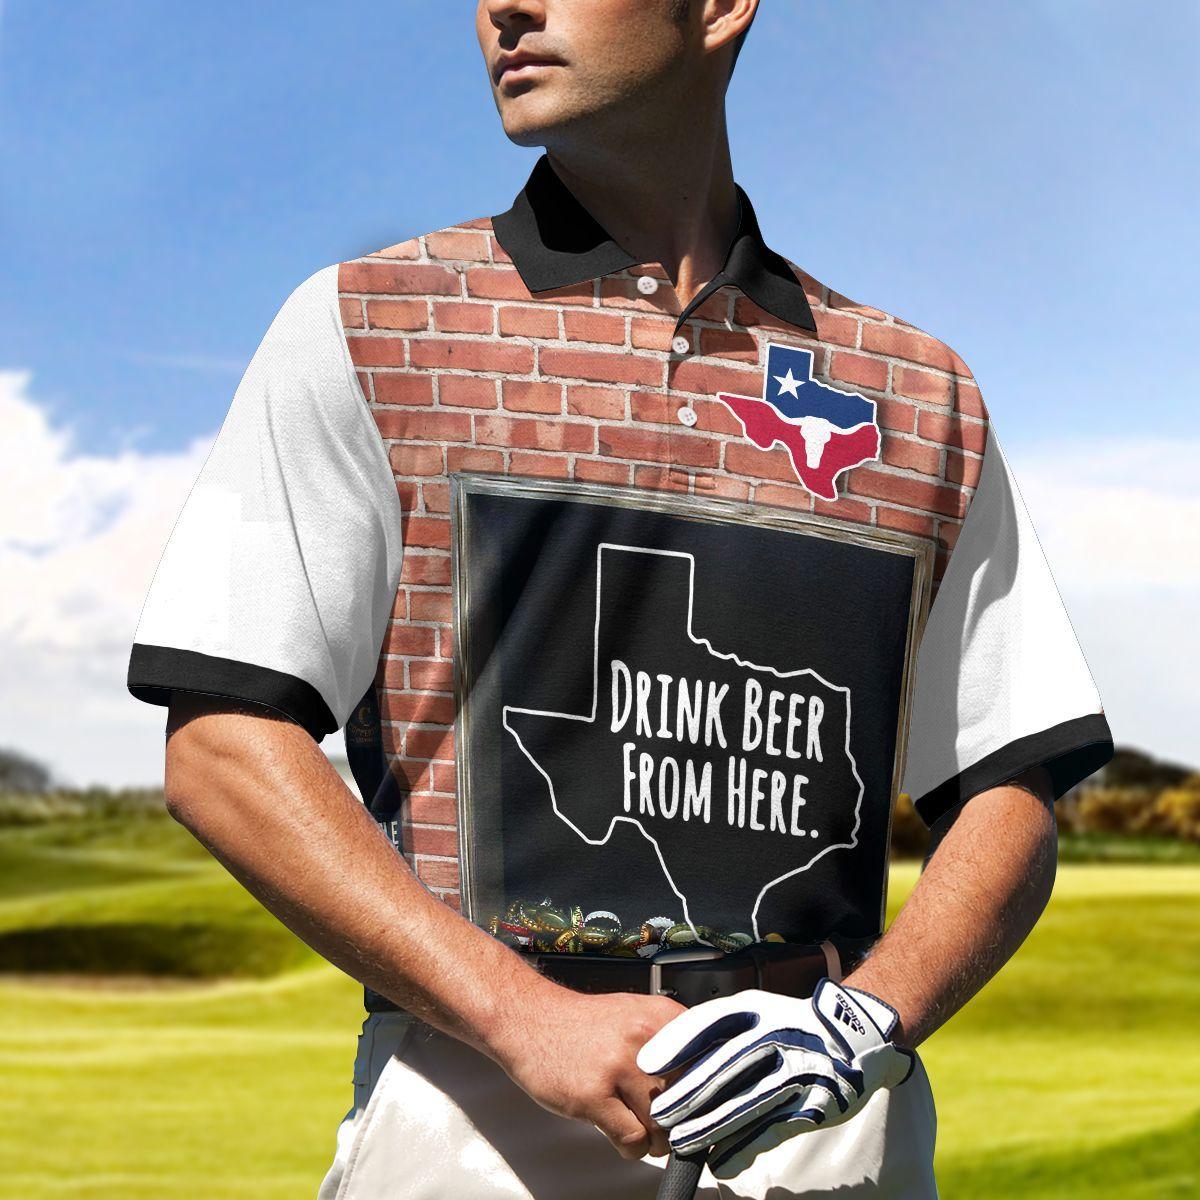 Texas Drink Beer Golf Ball Polo Shirt